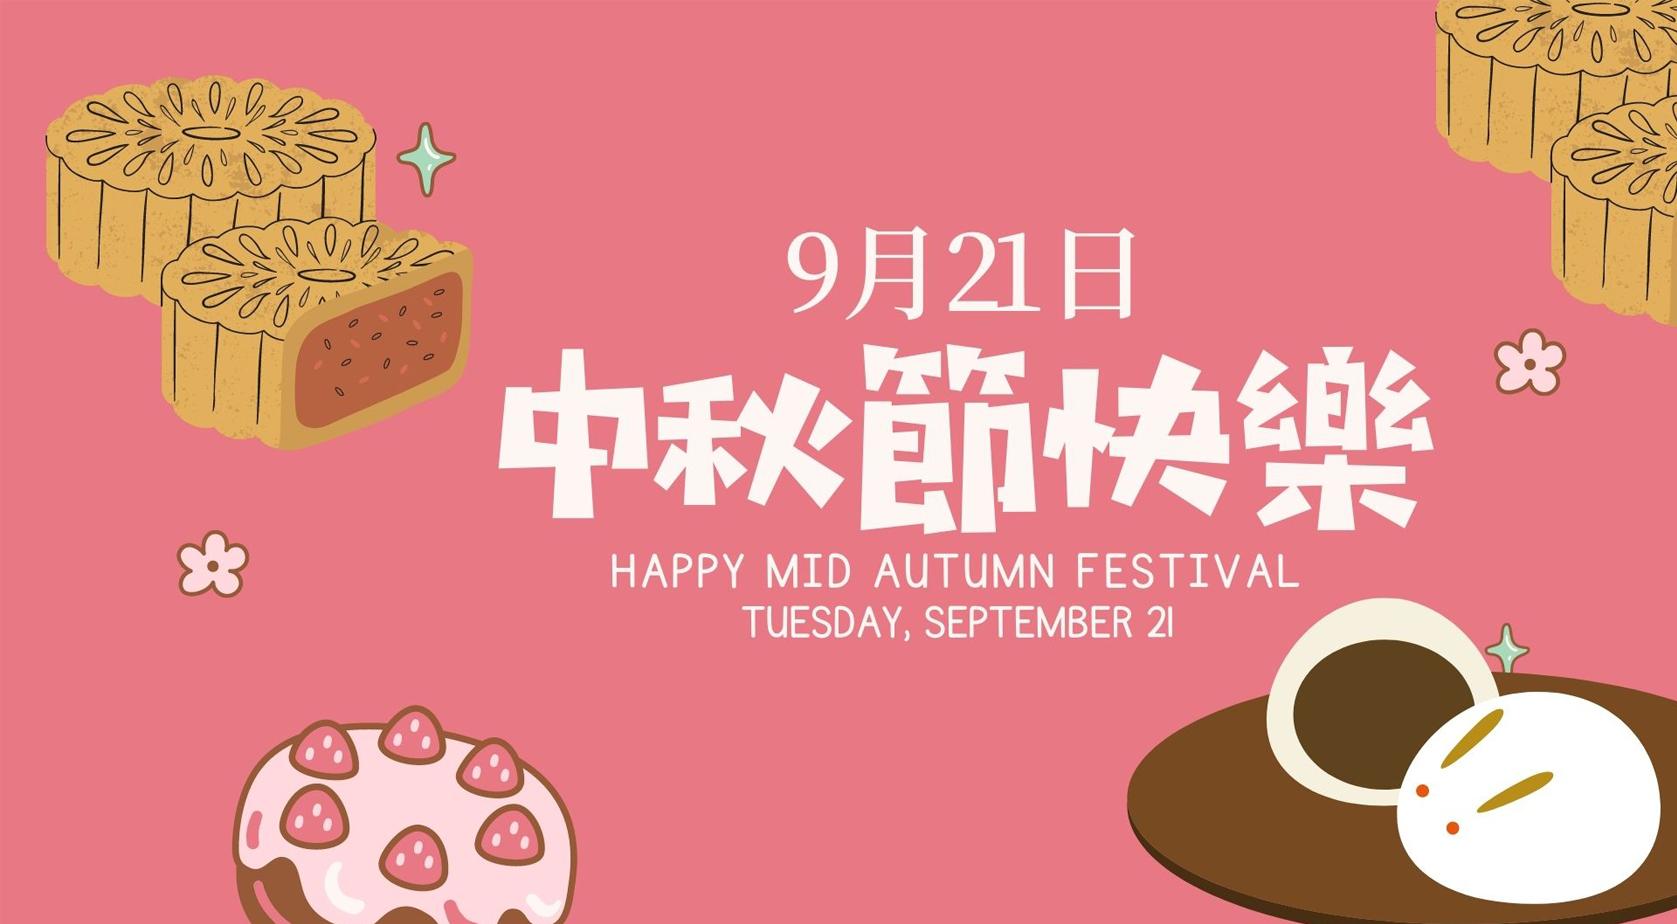 Mid Autumn Festival 2021 copy